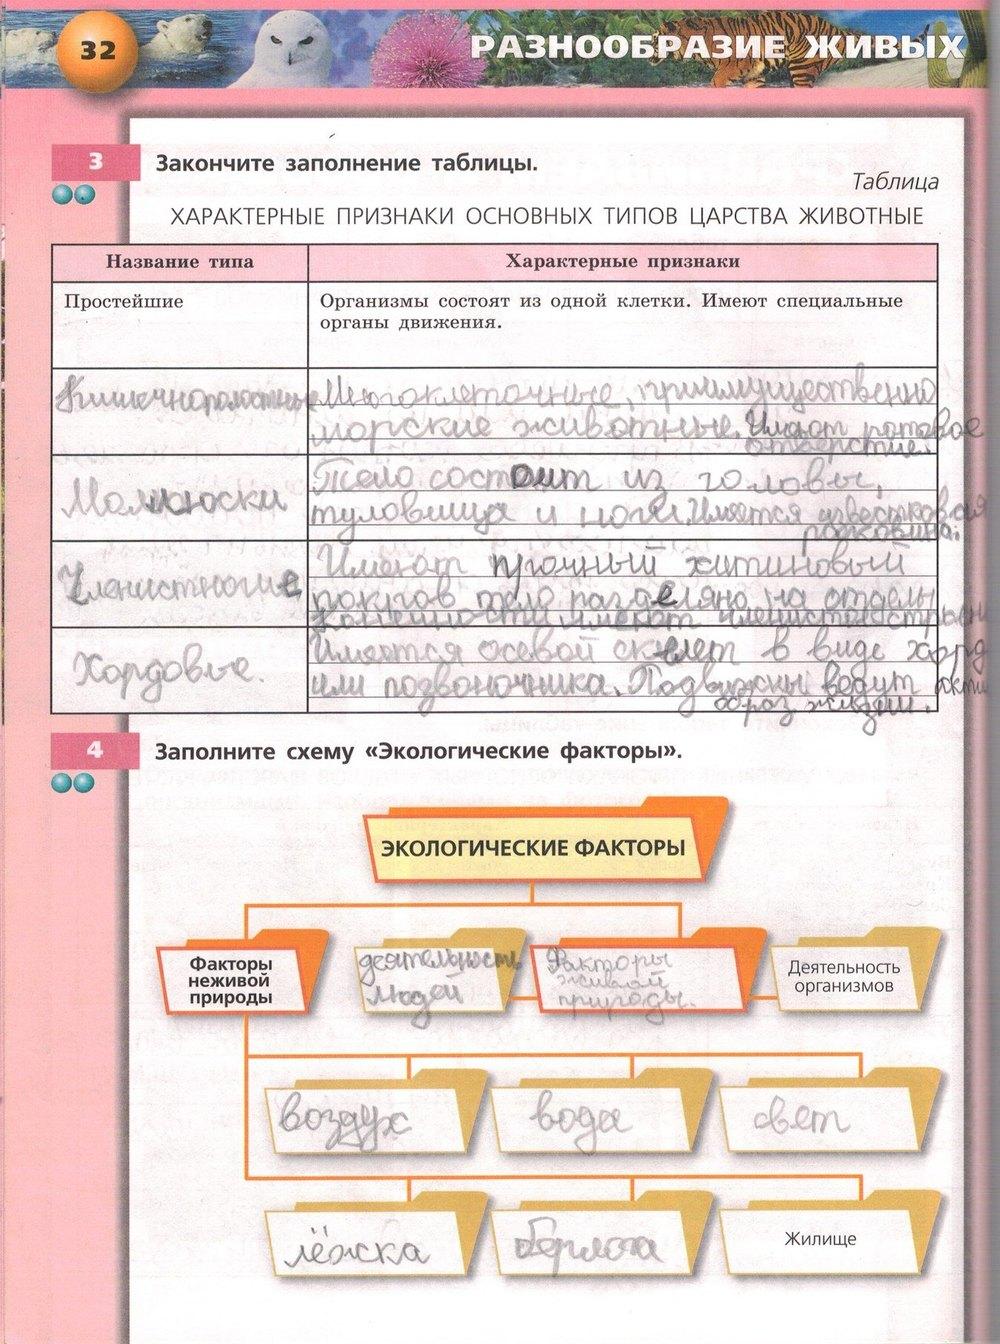 Гдз биология 6 класс рабочая тетрадь сухорукова